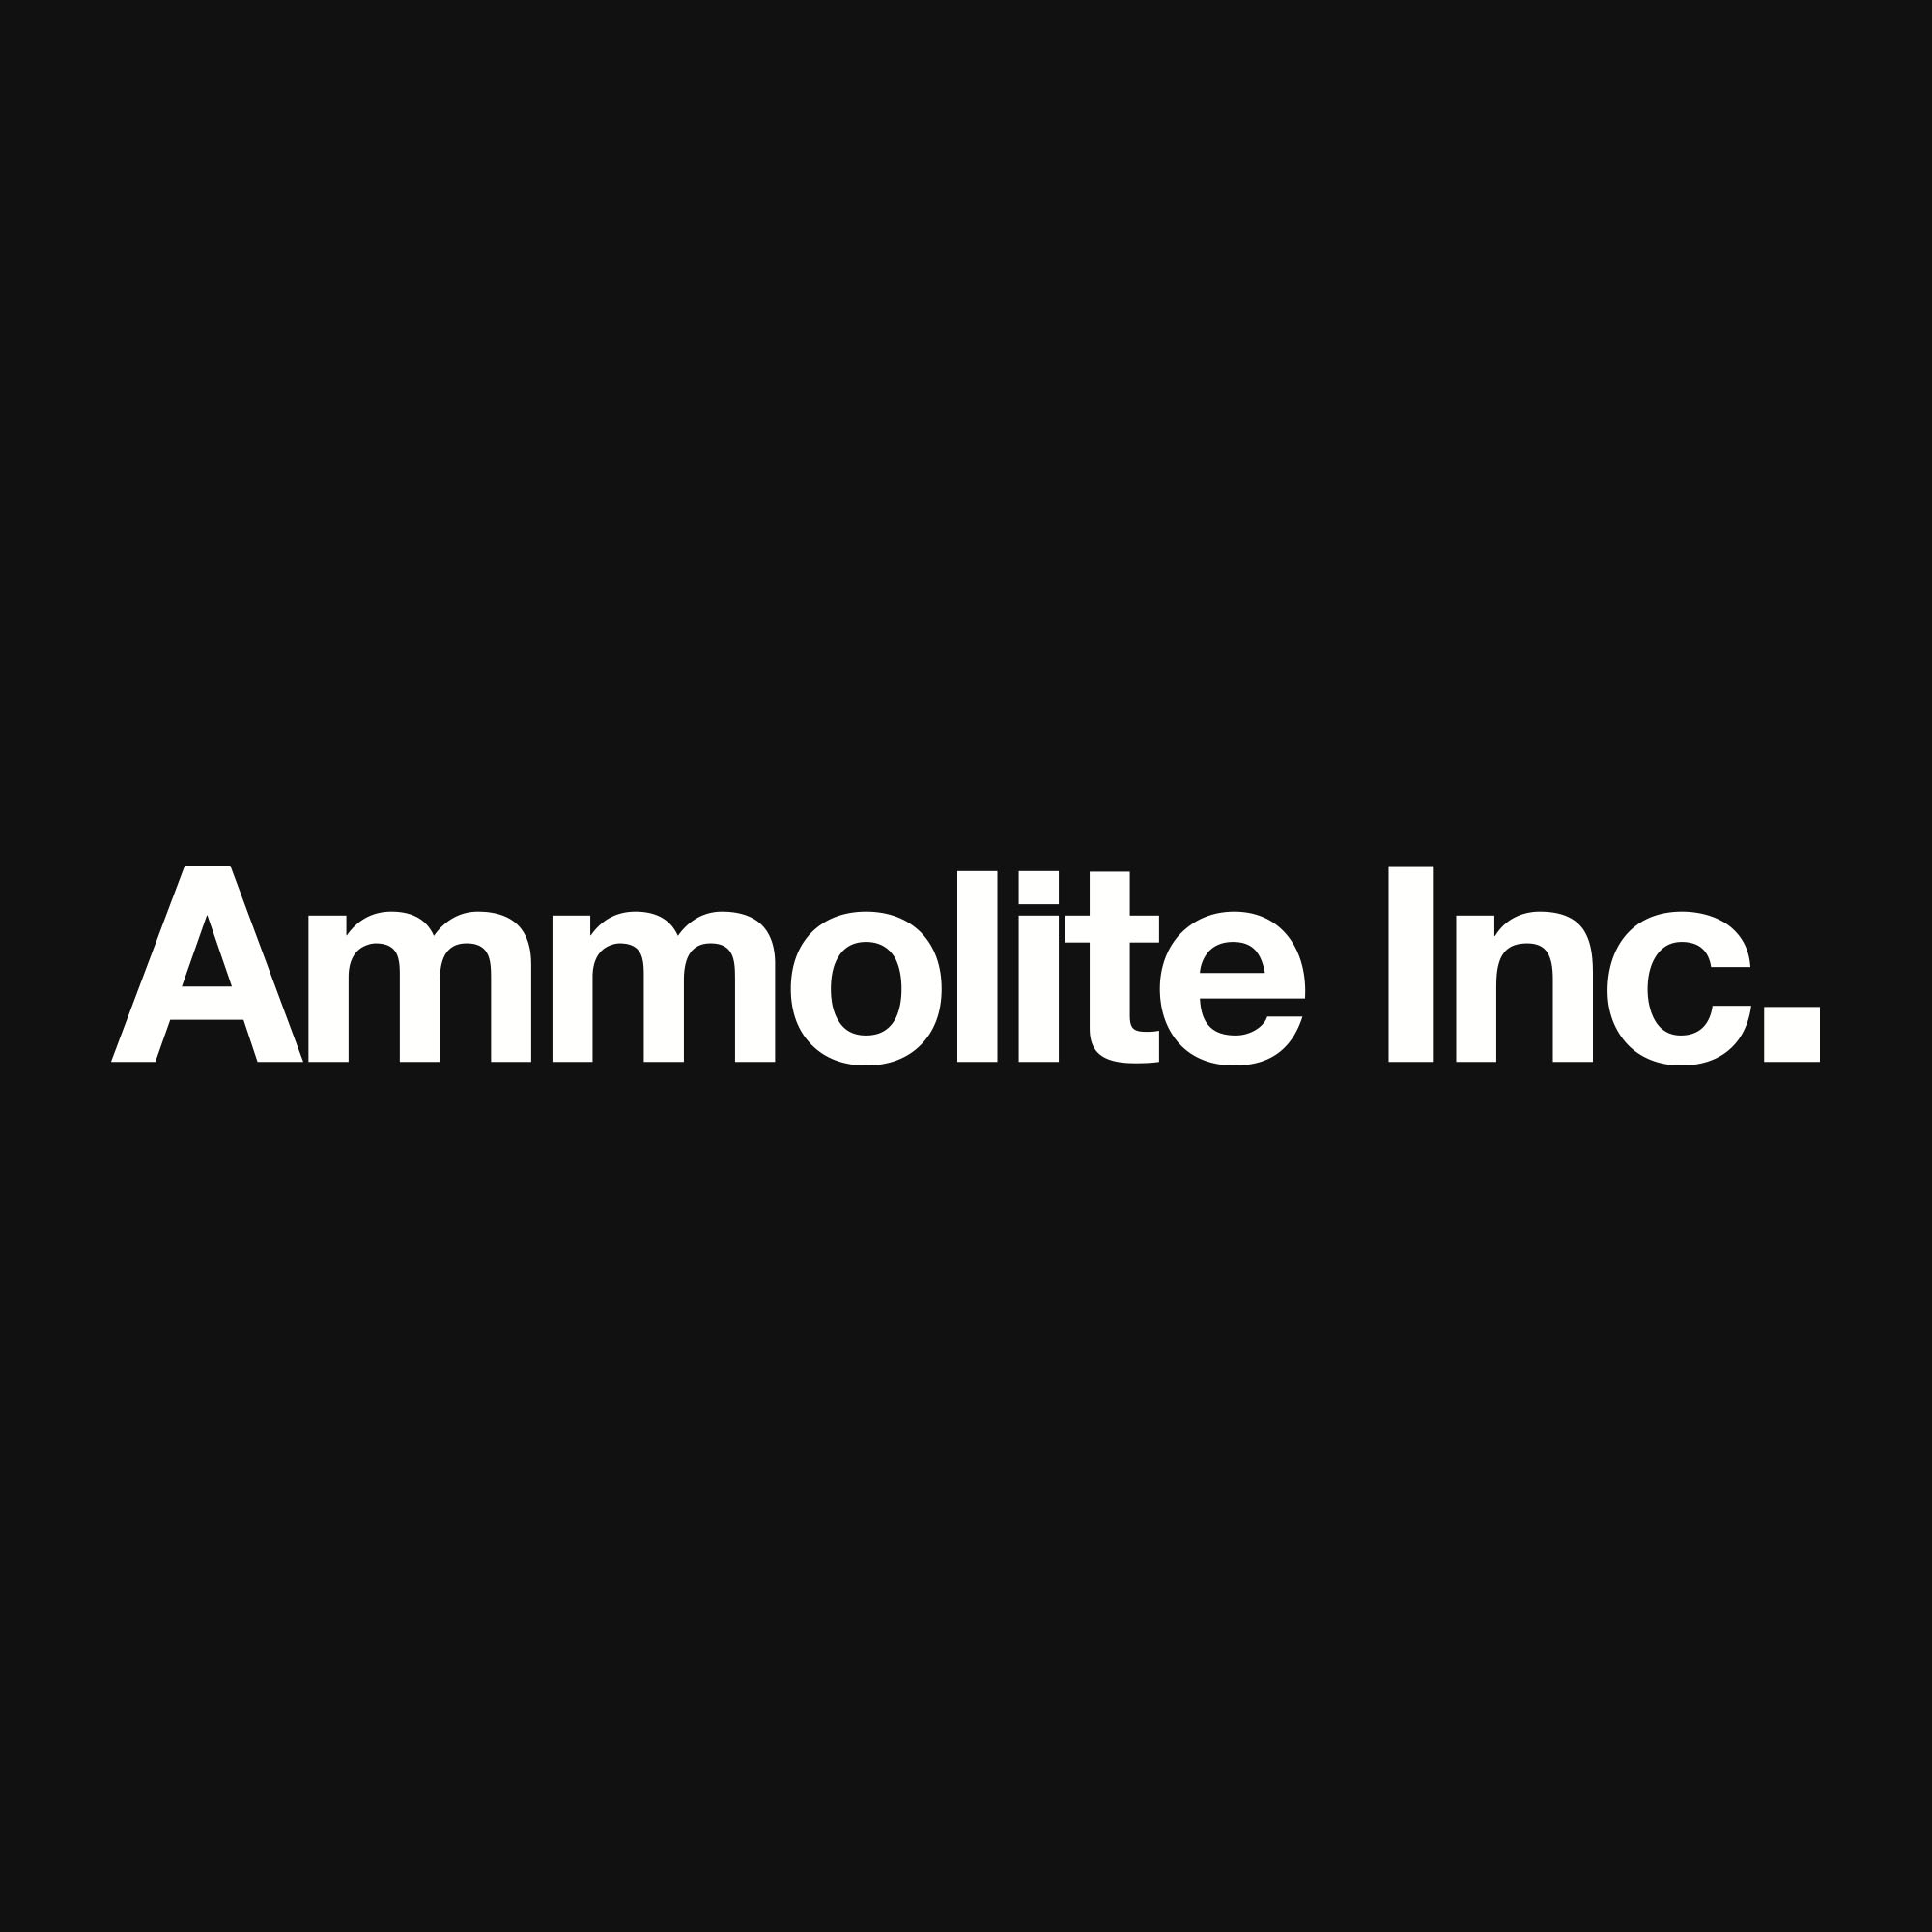 Ammolite Inc